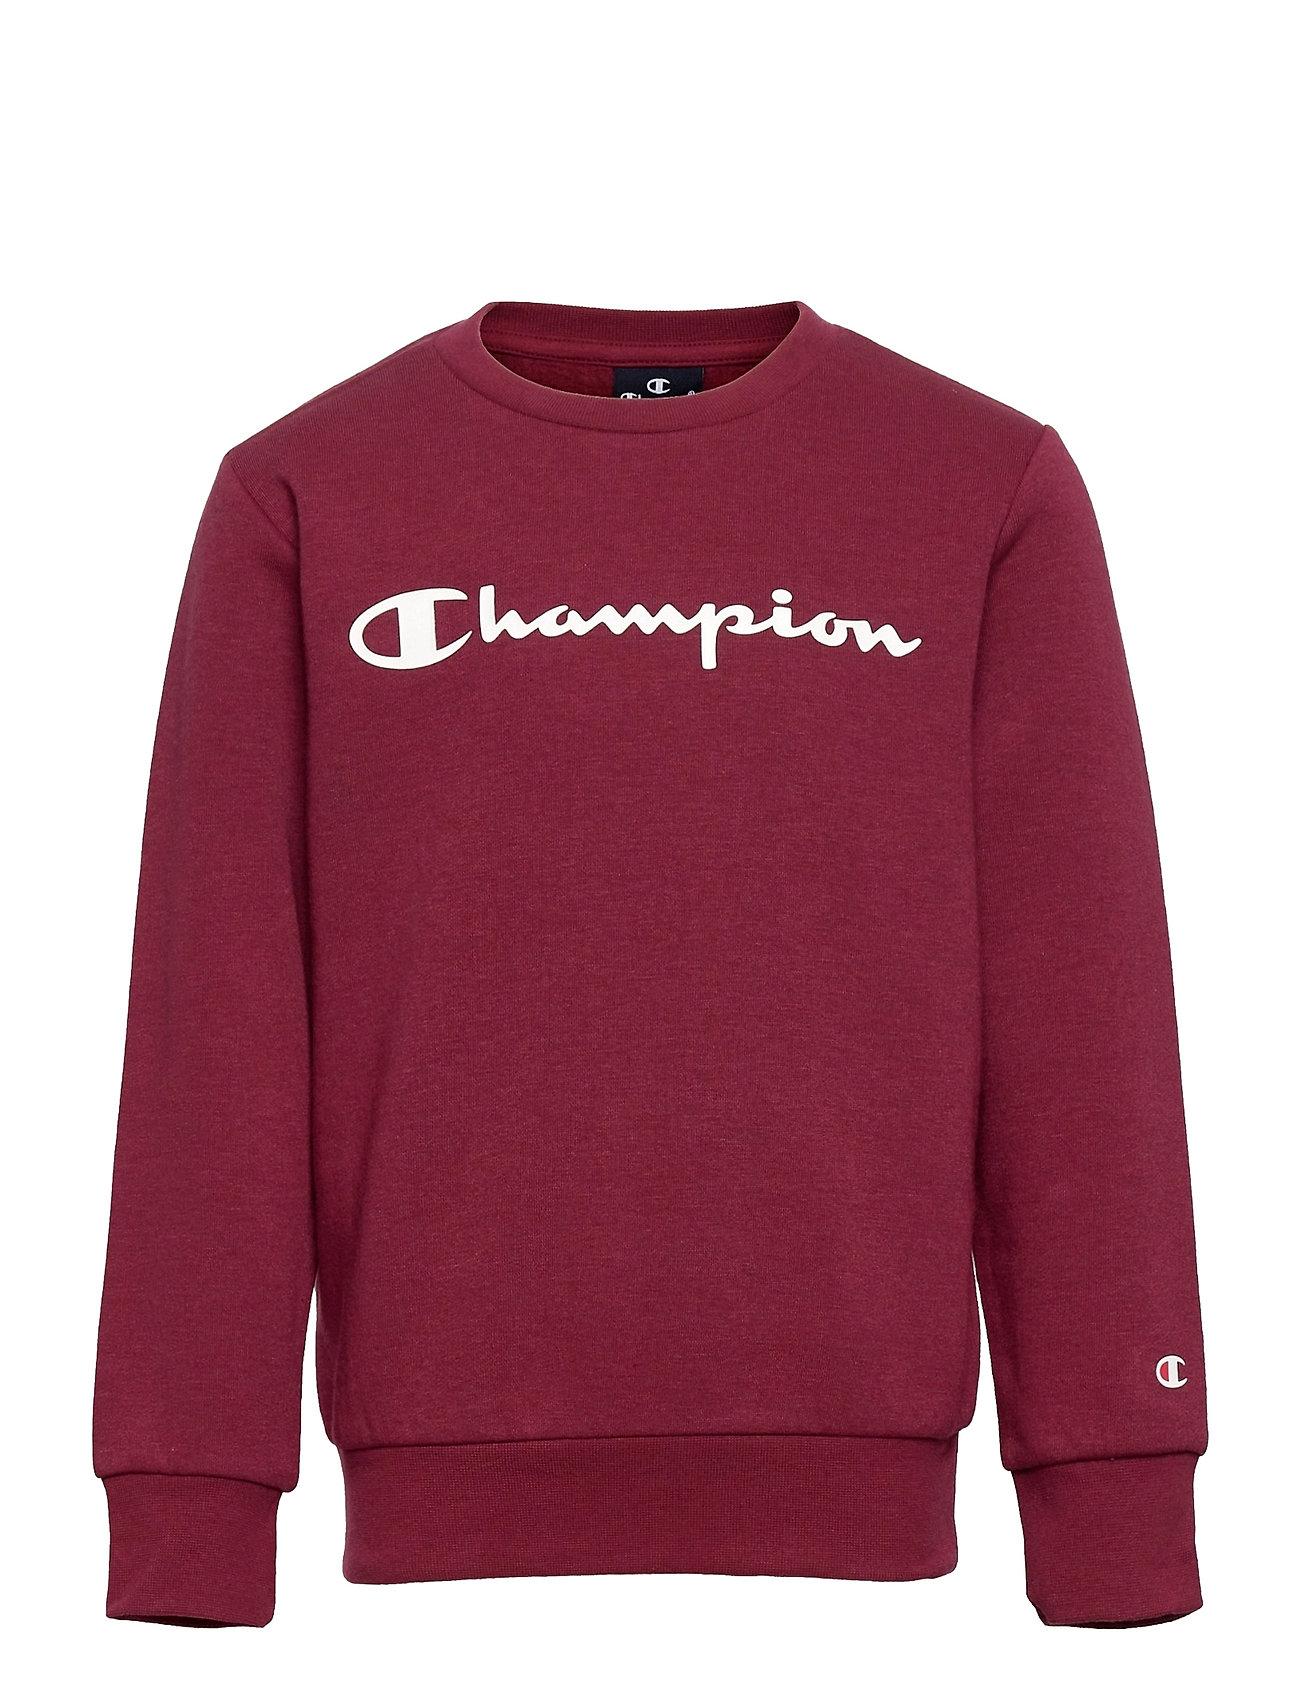 Crewneck Sweatshirt Sweatshirt Trøje Rød Champion